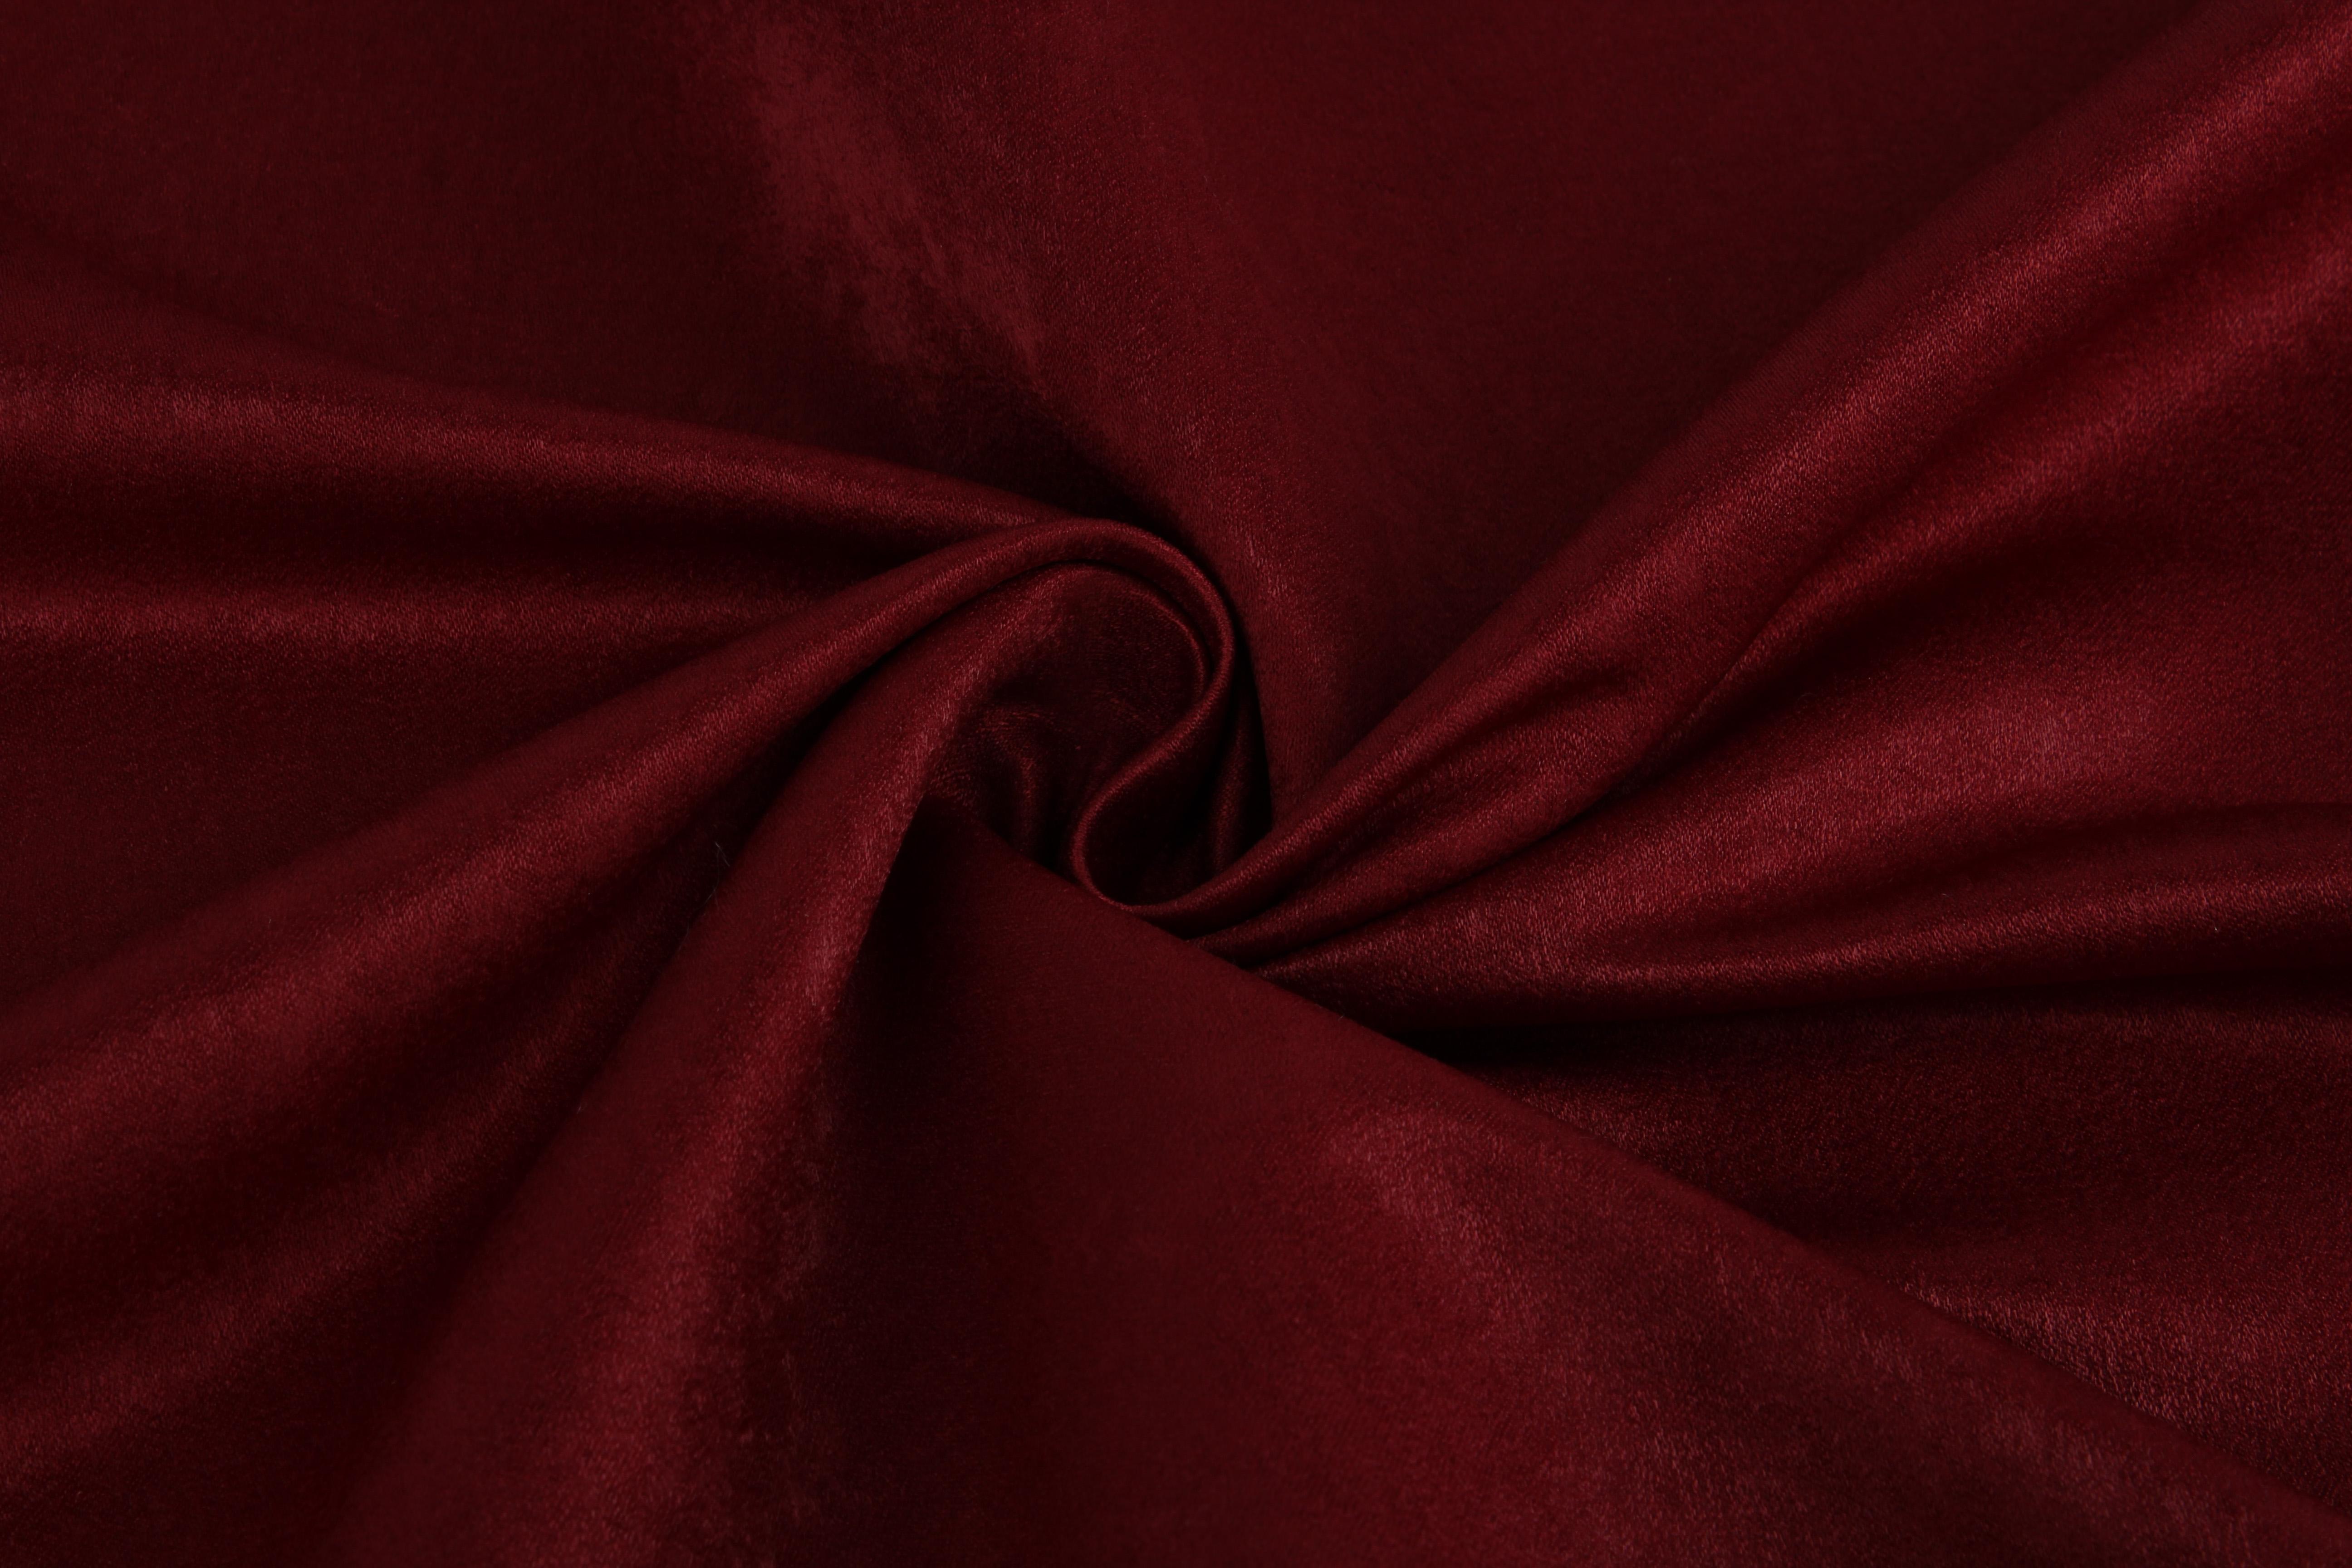 {} TexRepublic Материал Портьерная ткань Palette Цвет: Бордовый texrepublic материал портьерная ткань palette цвет брусничный